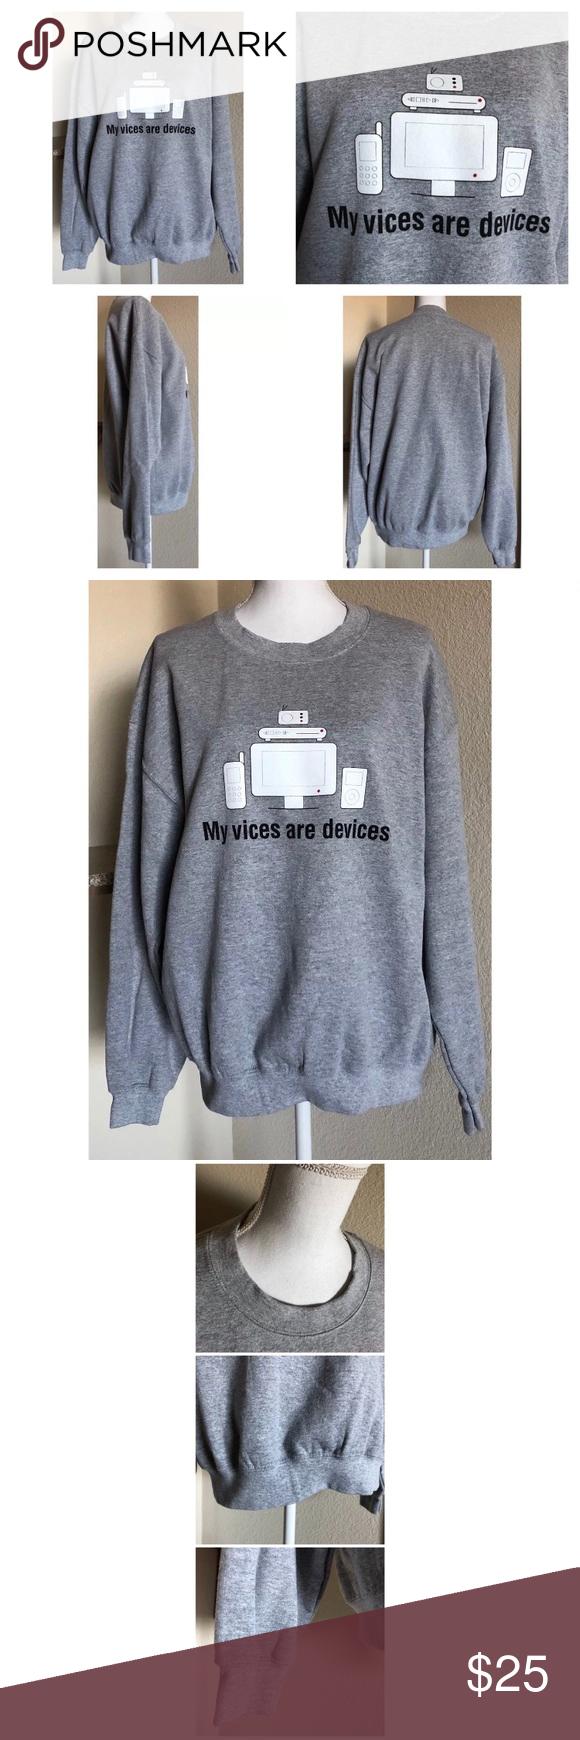 Gildan Sweatshirt My Vices Are Devices Mens L Gray Gildan Sweatshirt My Vices Are Devices Mens L Gray Cotton 50 5 Mens Sweatshirts Sweatshirts Clothes Design [ 1740 x 580 Pixel ]